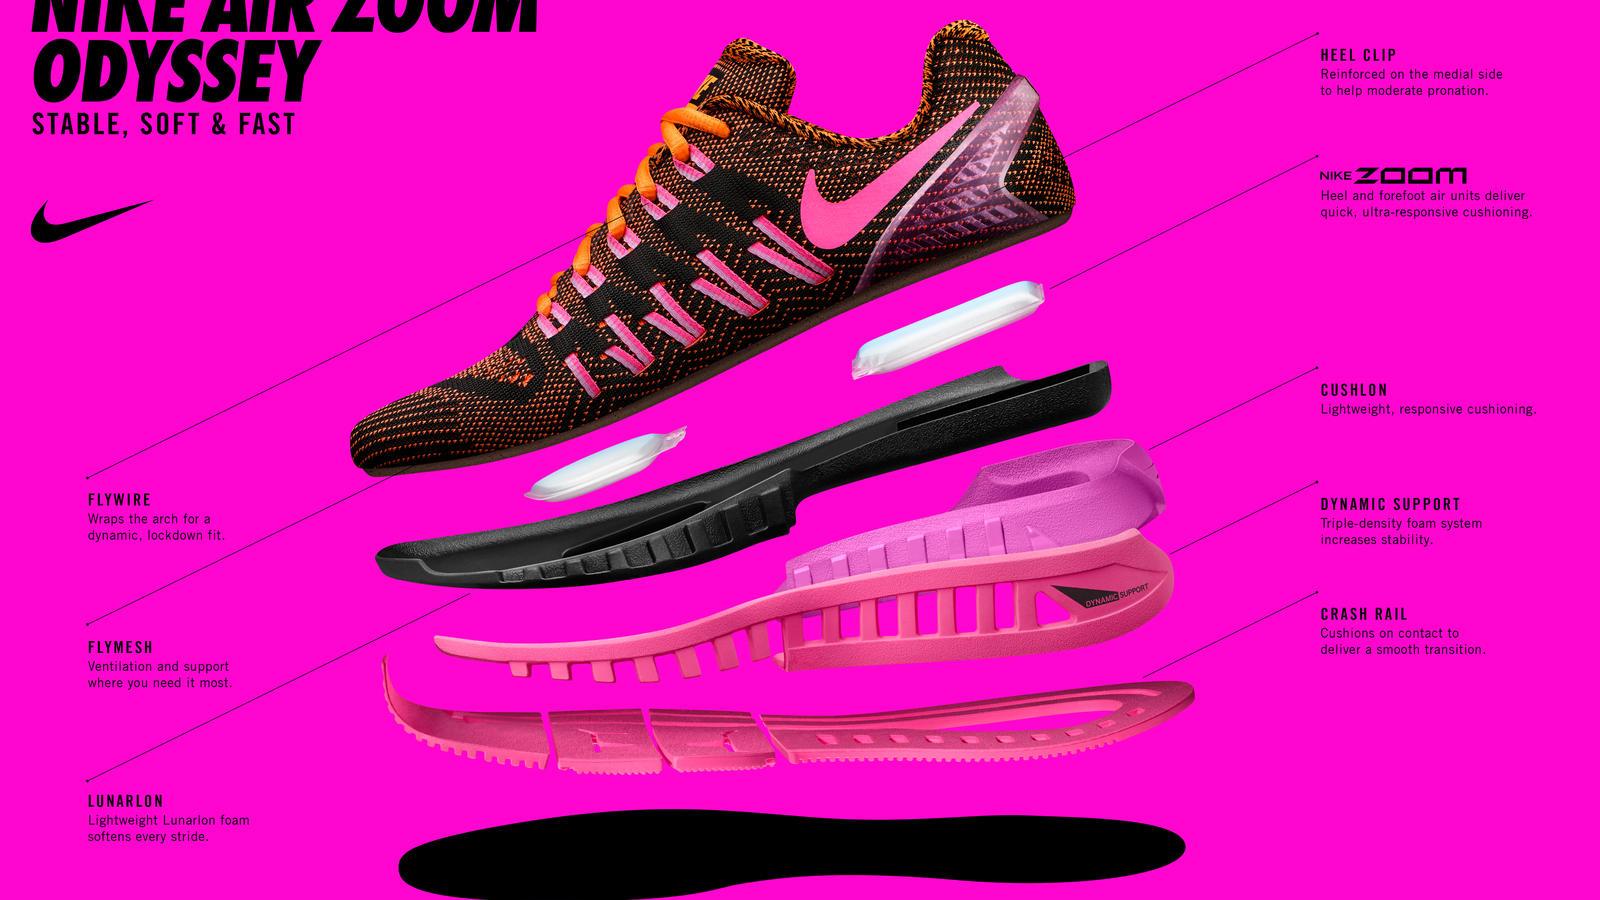 Nike Air Zoom Odyssey women's